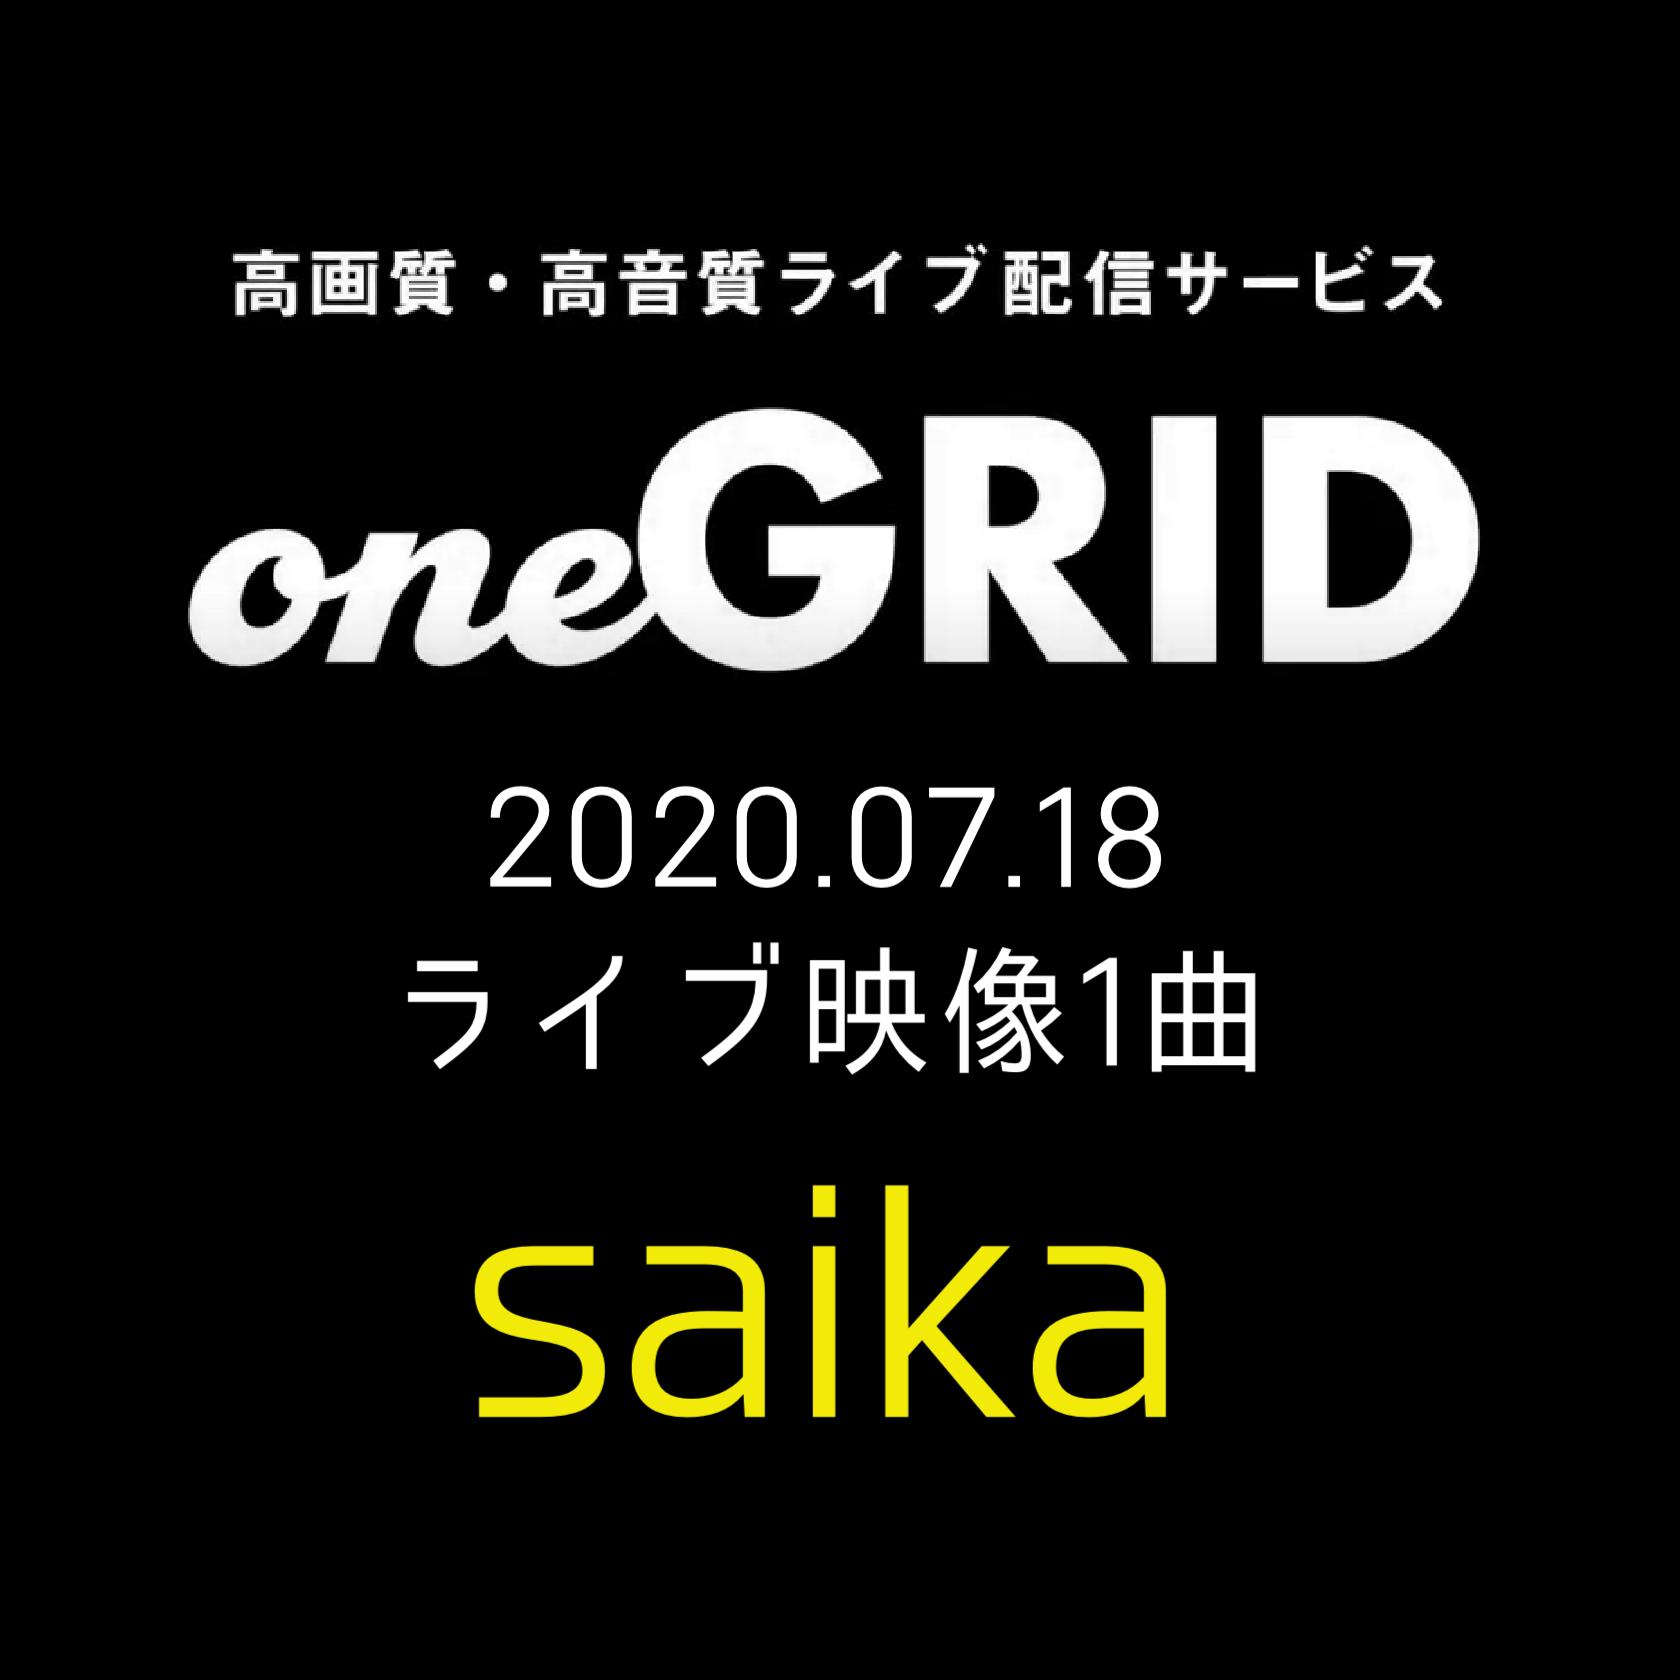 7/18saikaライブ映像